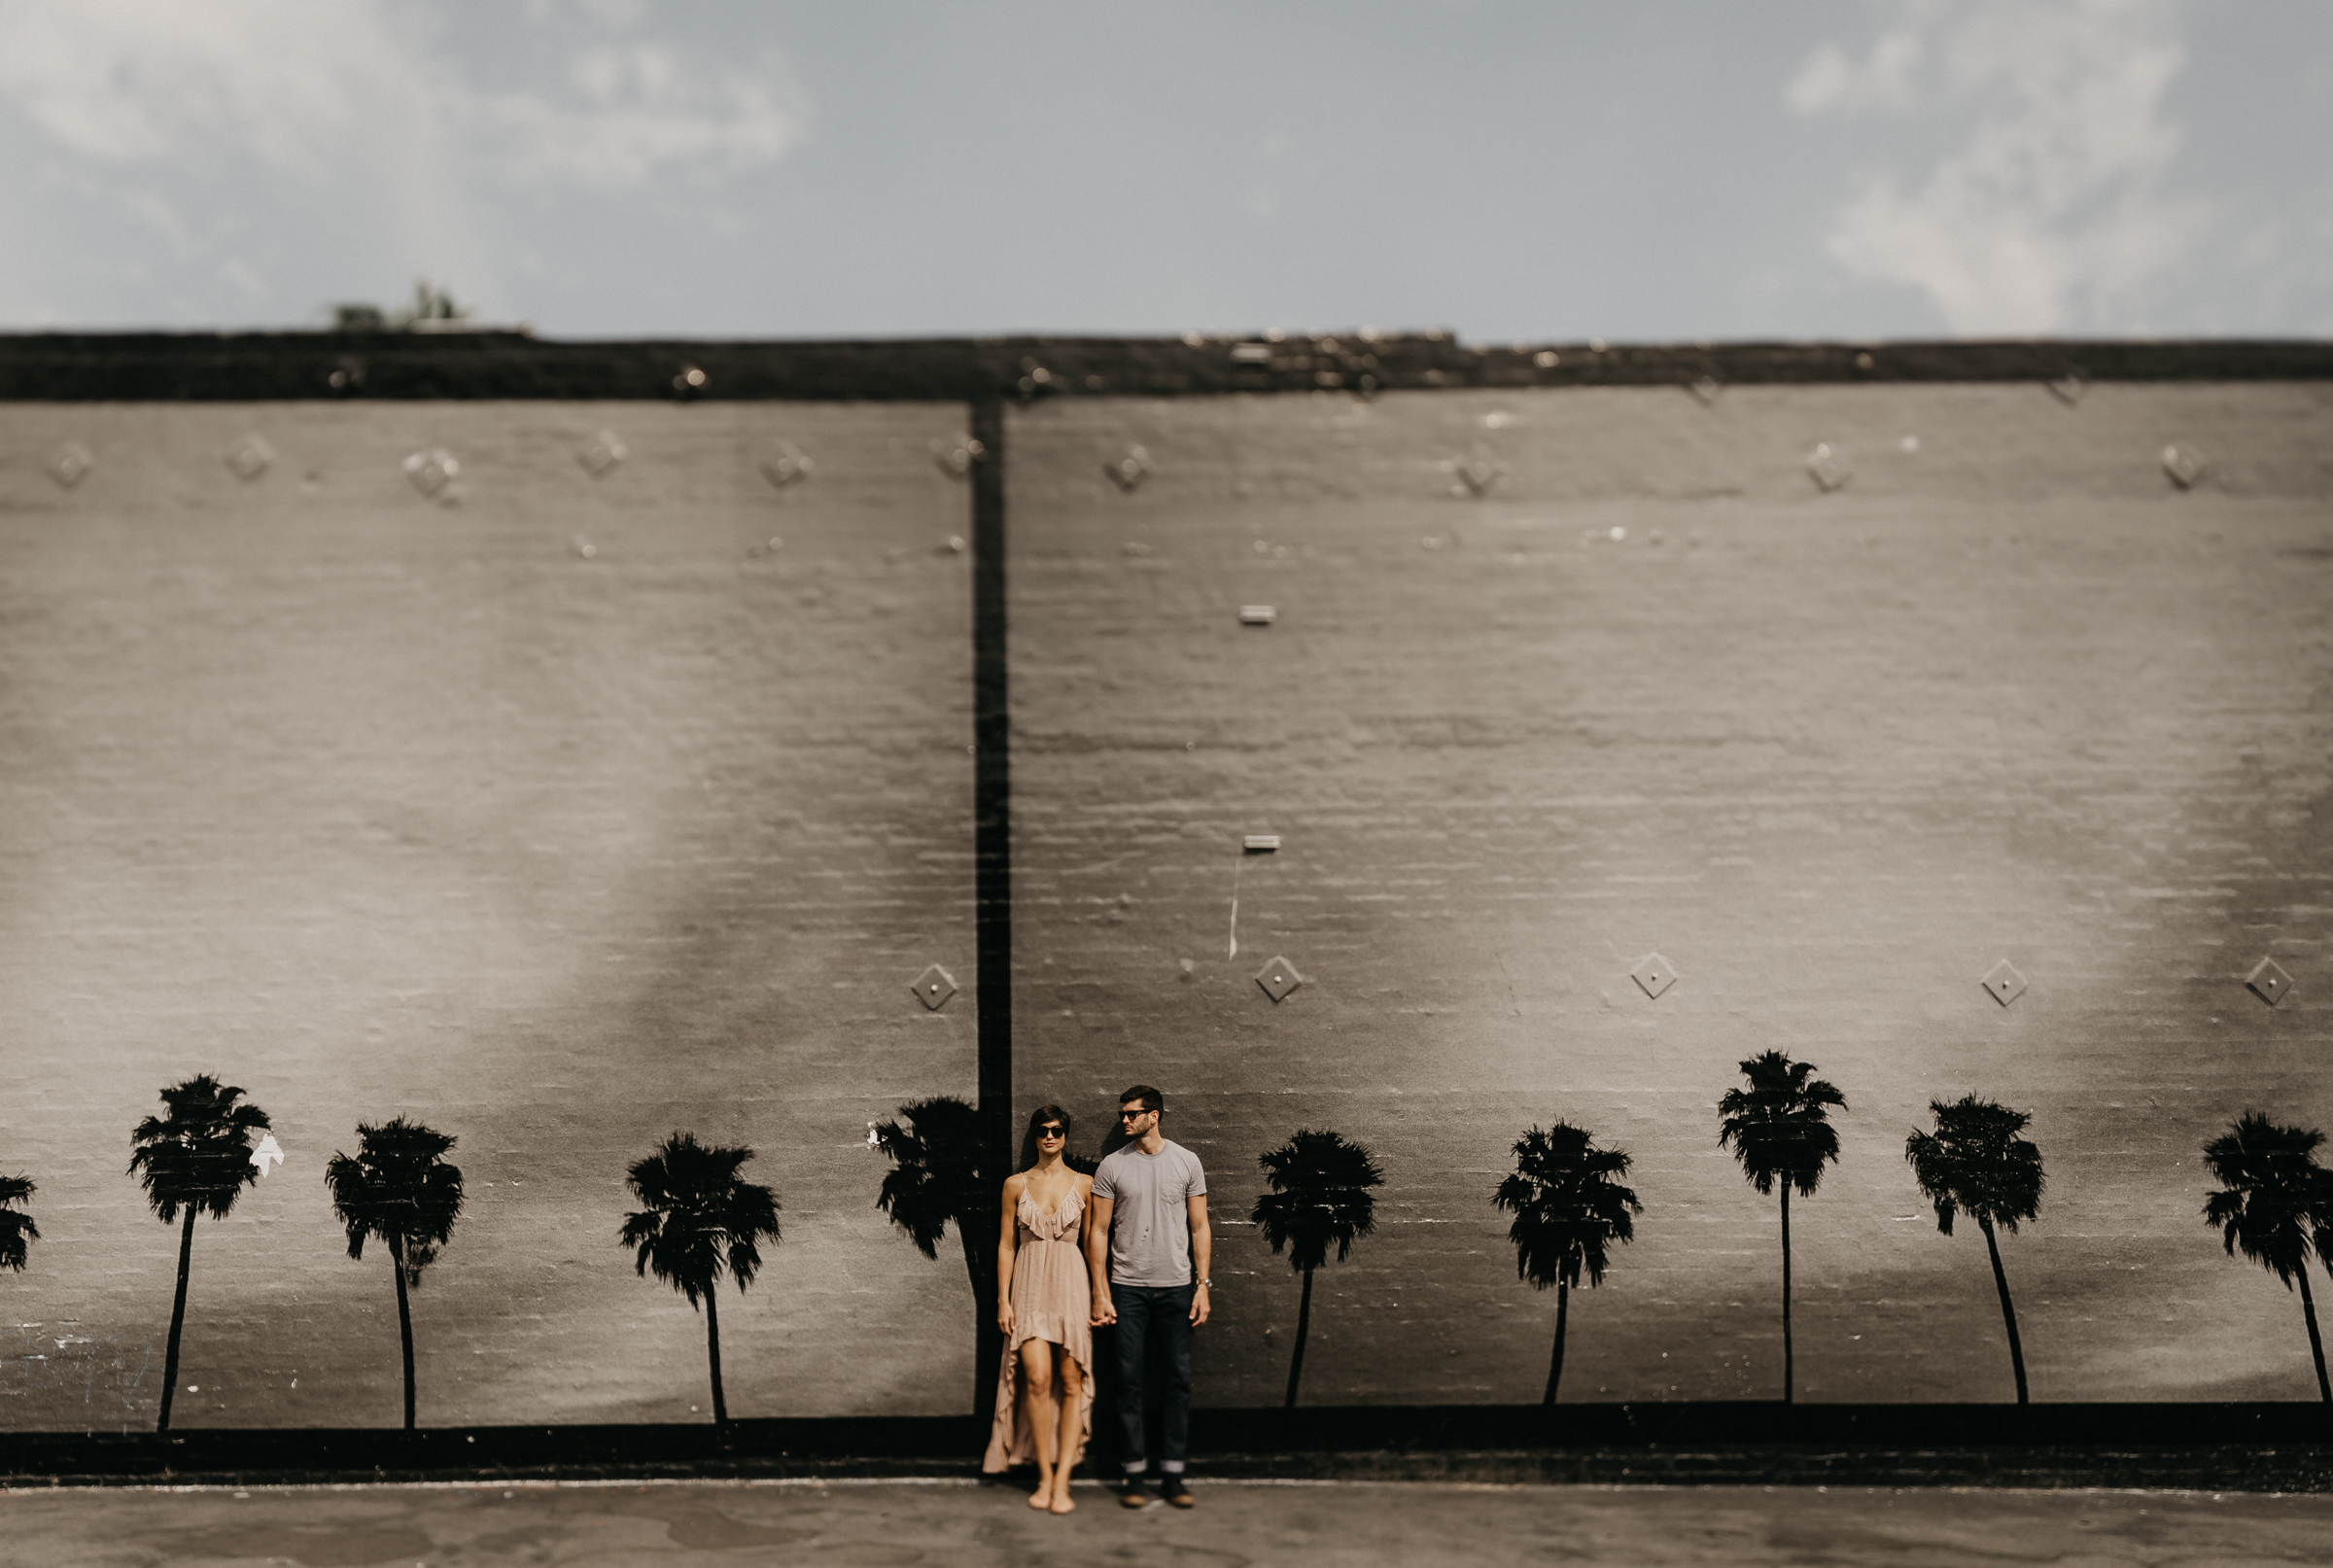 Isaiah + Taylor Photography - Venice Beach & Santa Monica Engagement Session, Los Angeles Wedding Photographer-025.jpg